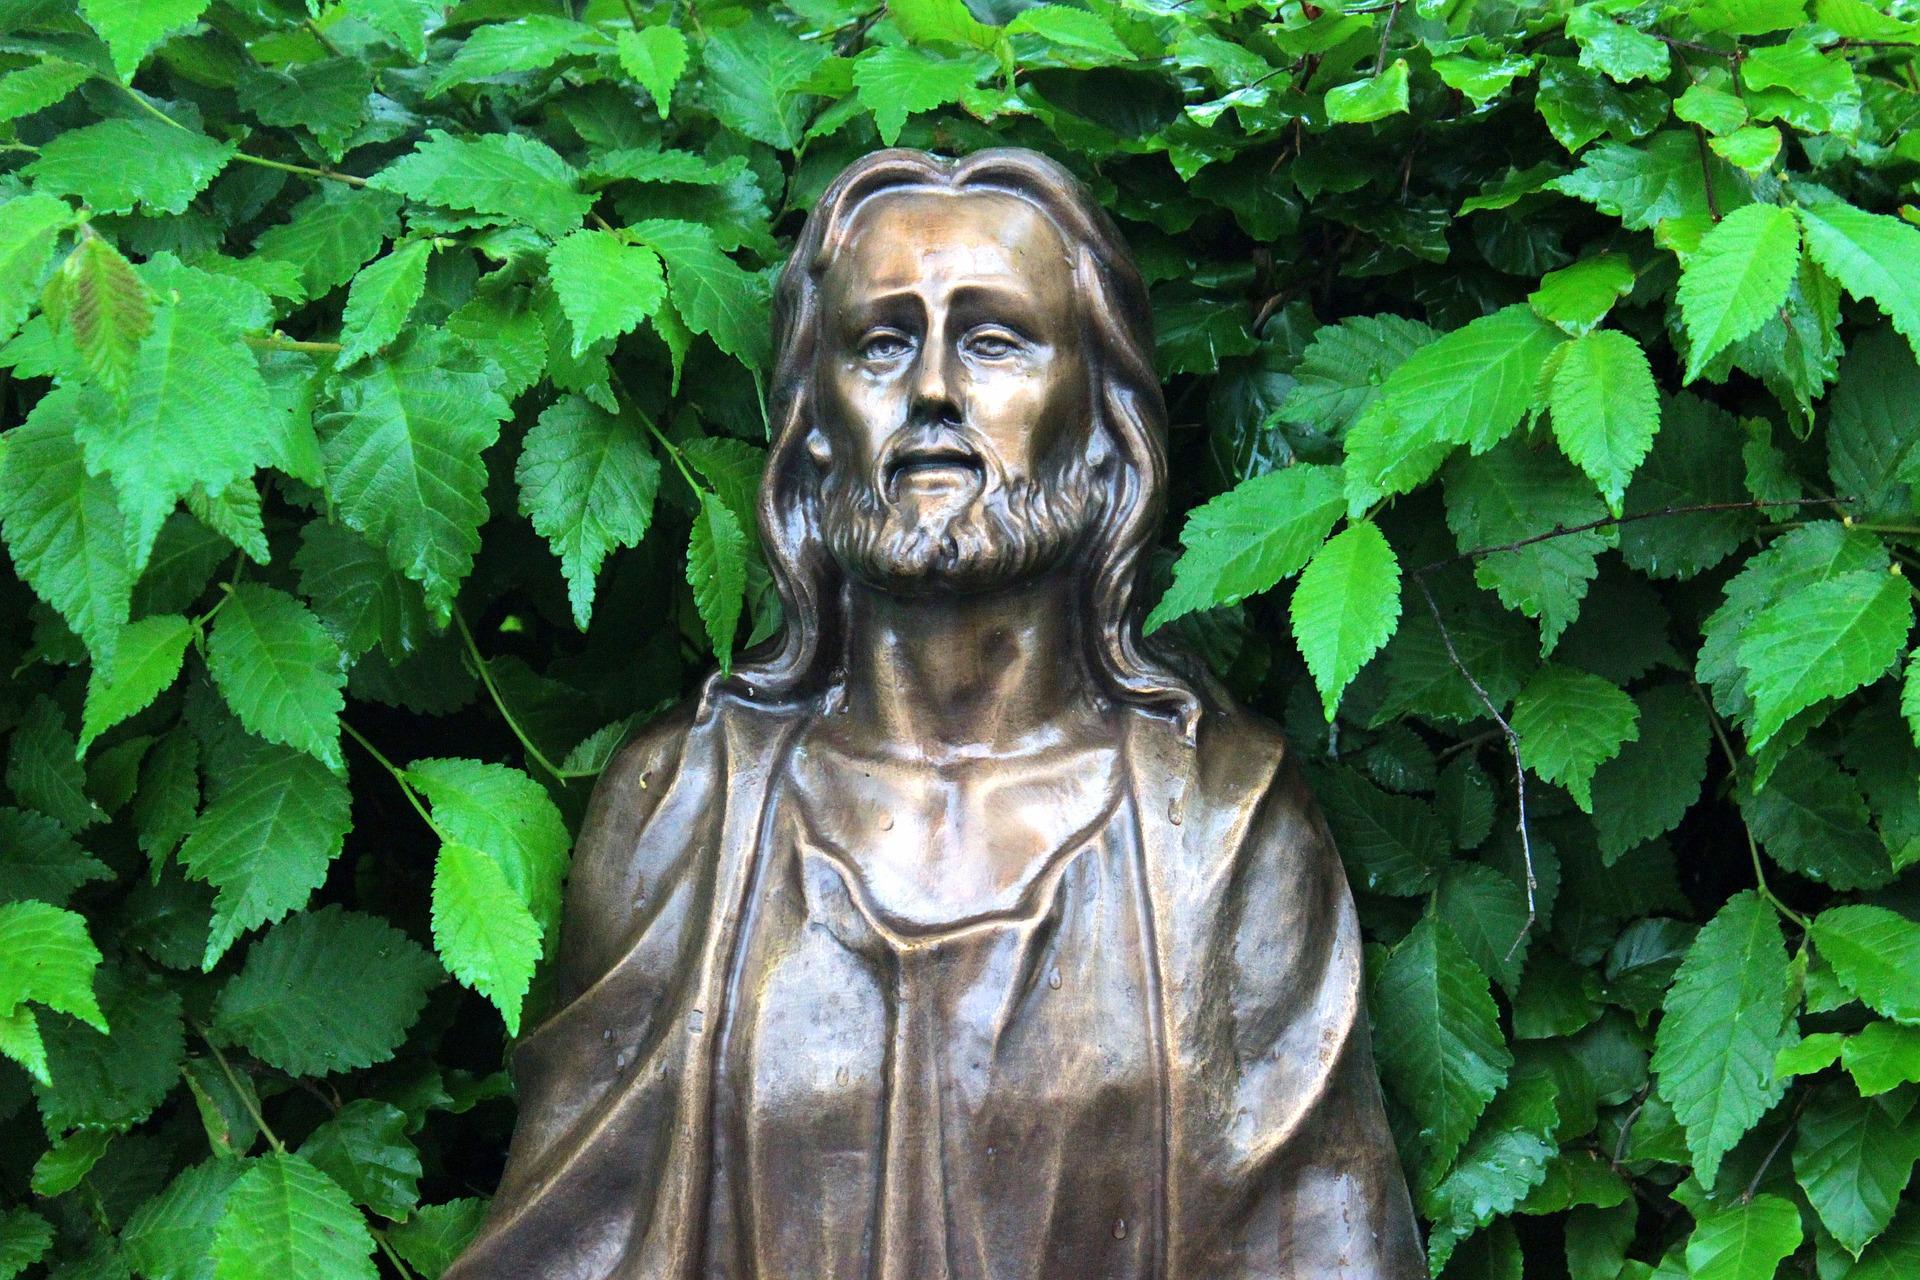 Jesus Sculpture, Carve, Figure, Jesus, Object, HQ Photo